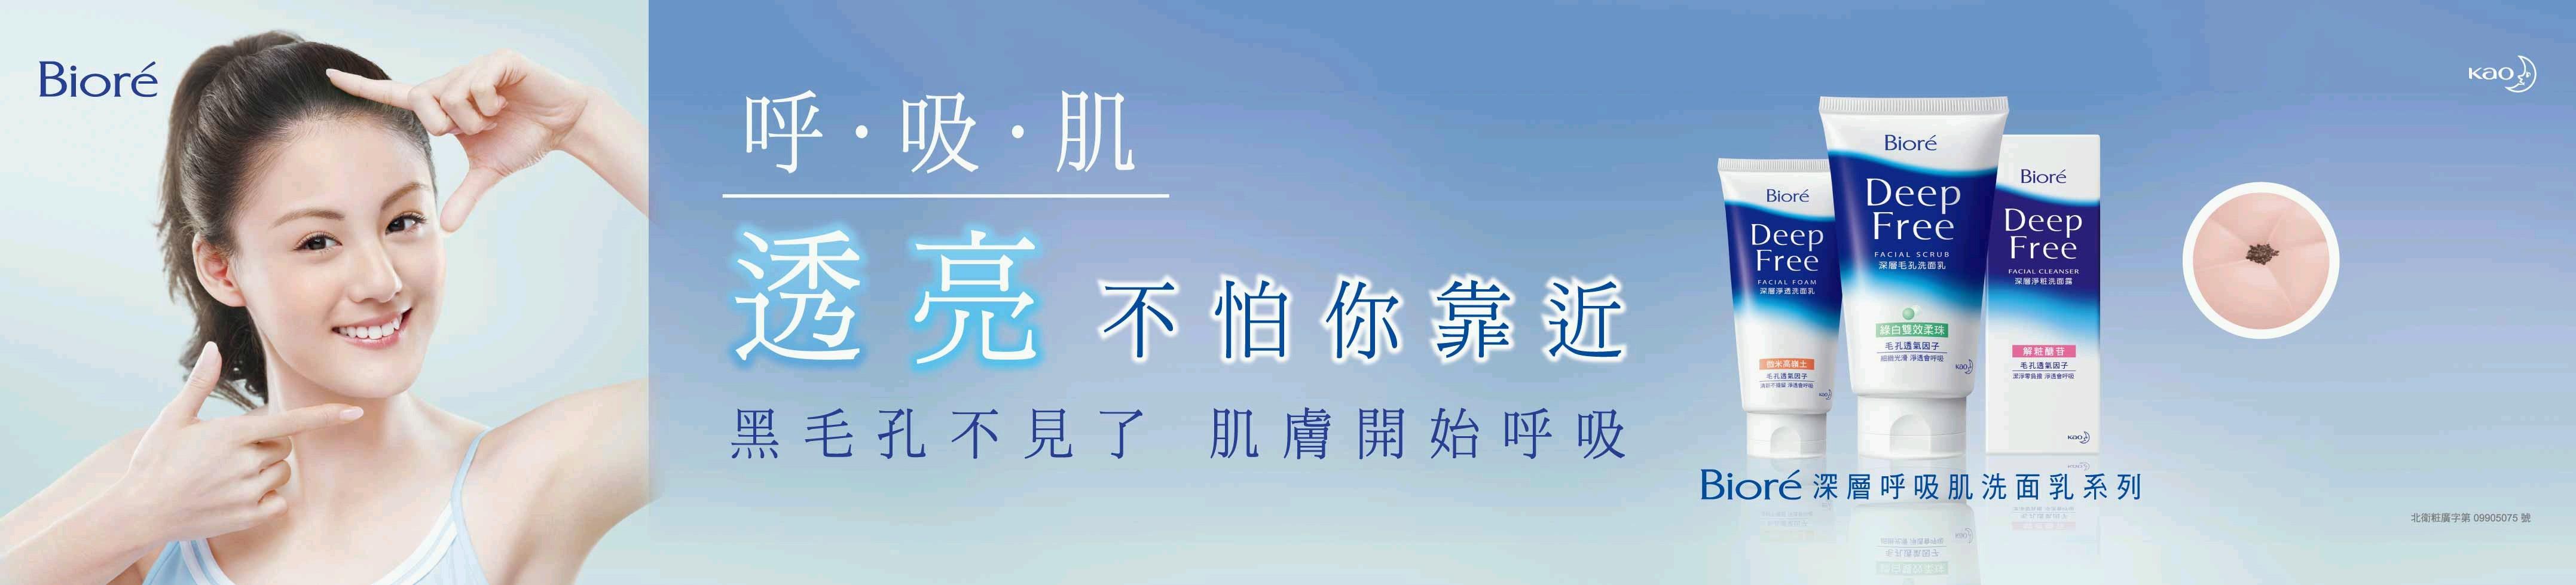 Deep Free 台北MRT車廂內橫式廣告完稿-0630.jpg